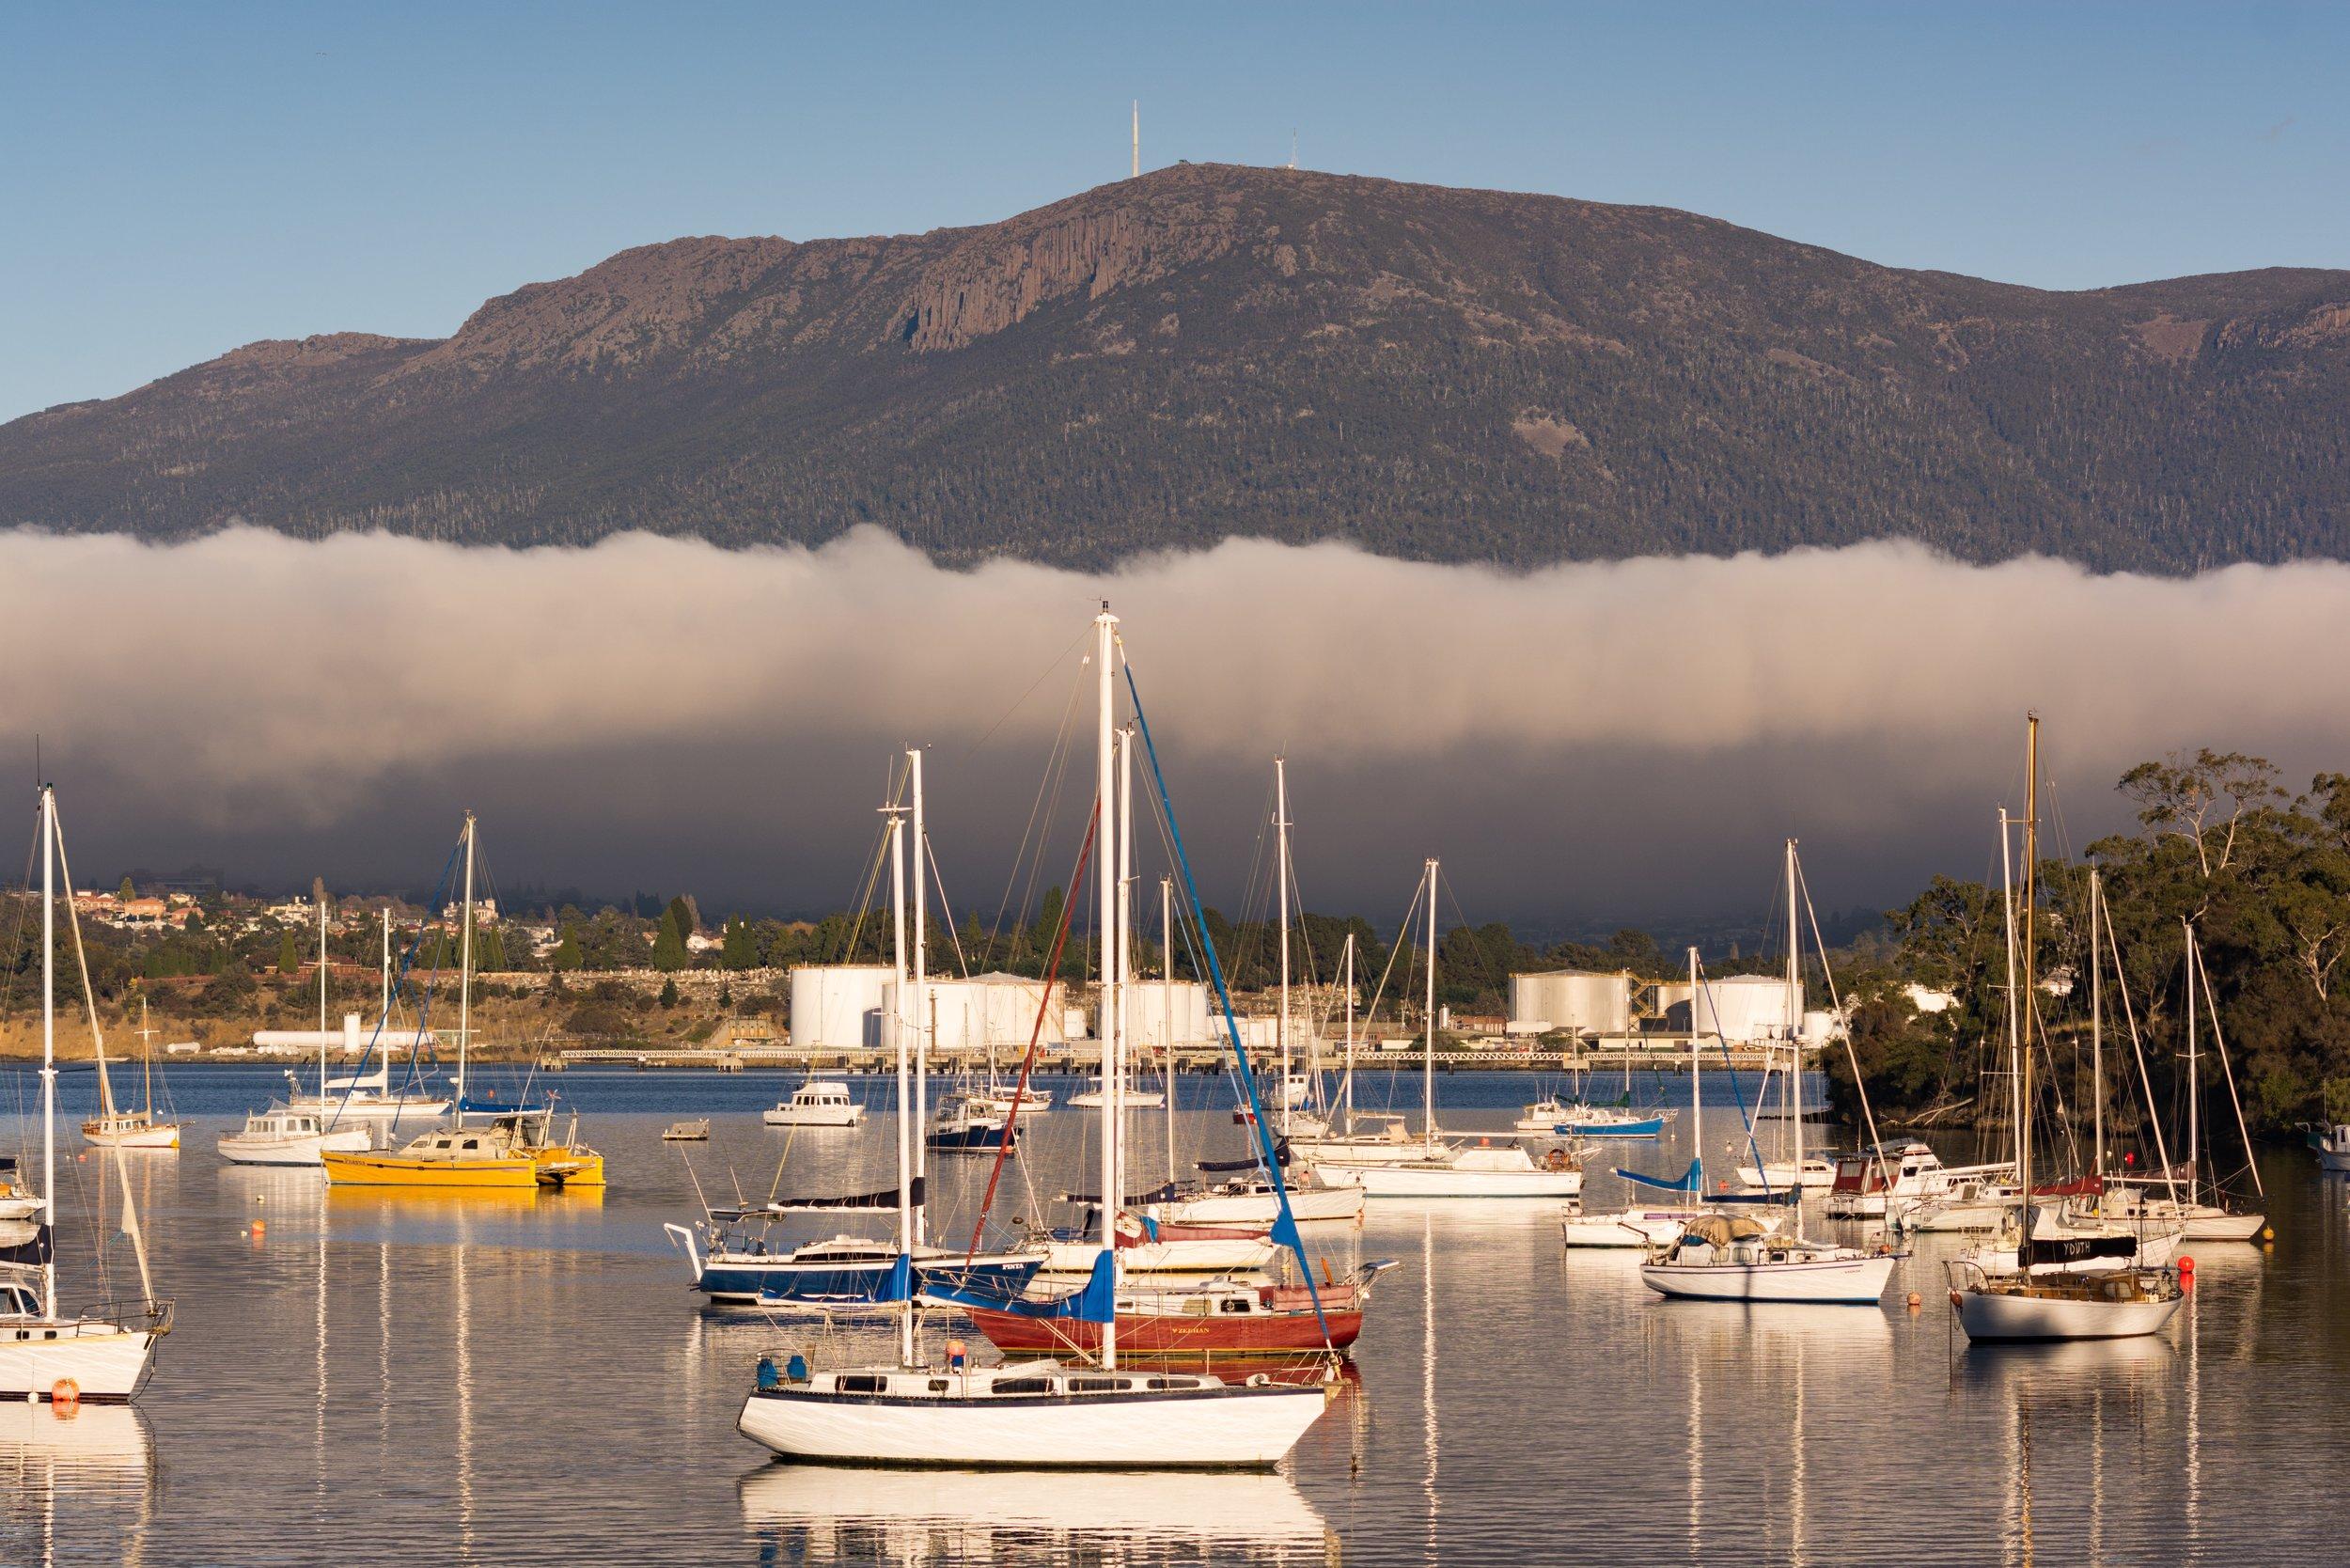 Kunanyi / Mt. Wellington from Gielston Bay  Nikon D7100